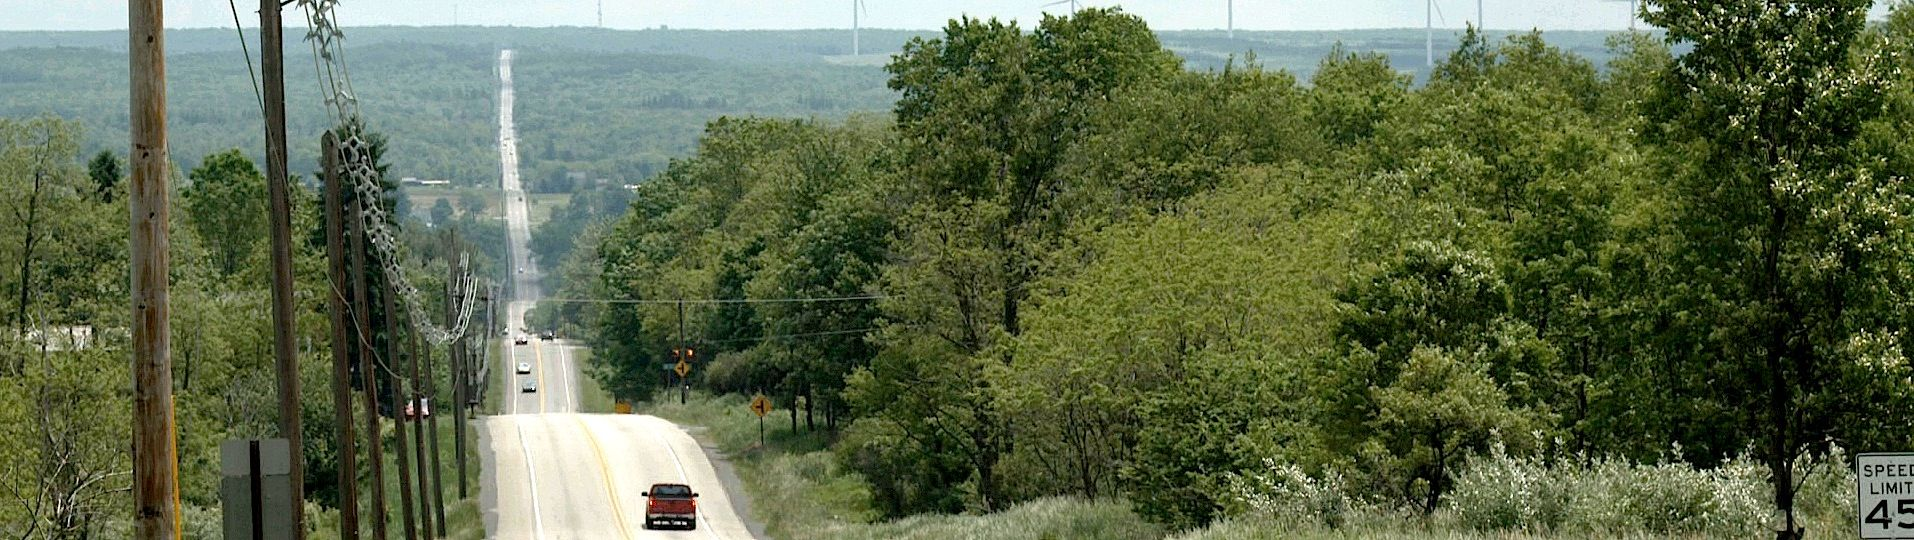 Scenic Two-lane Roads